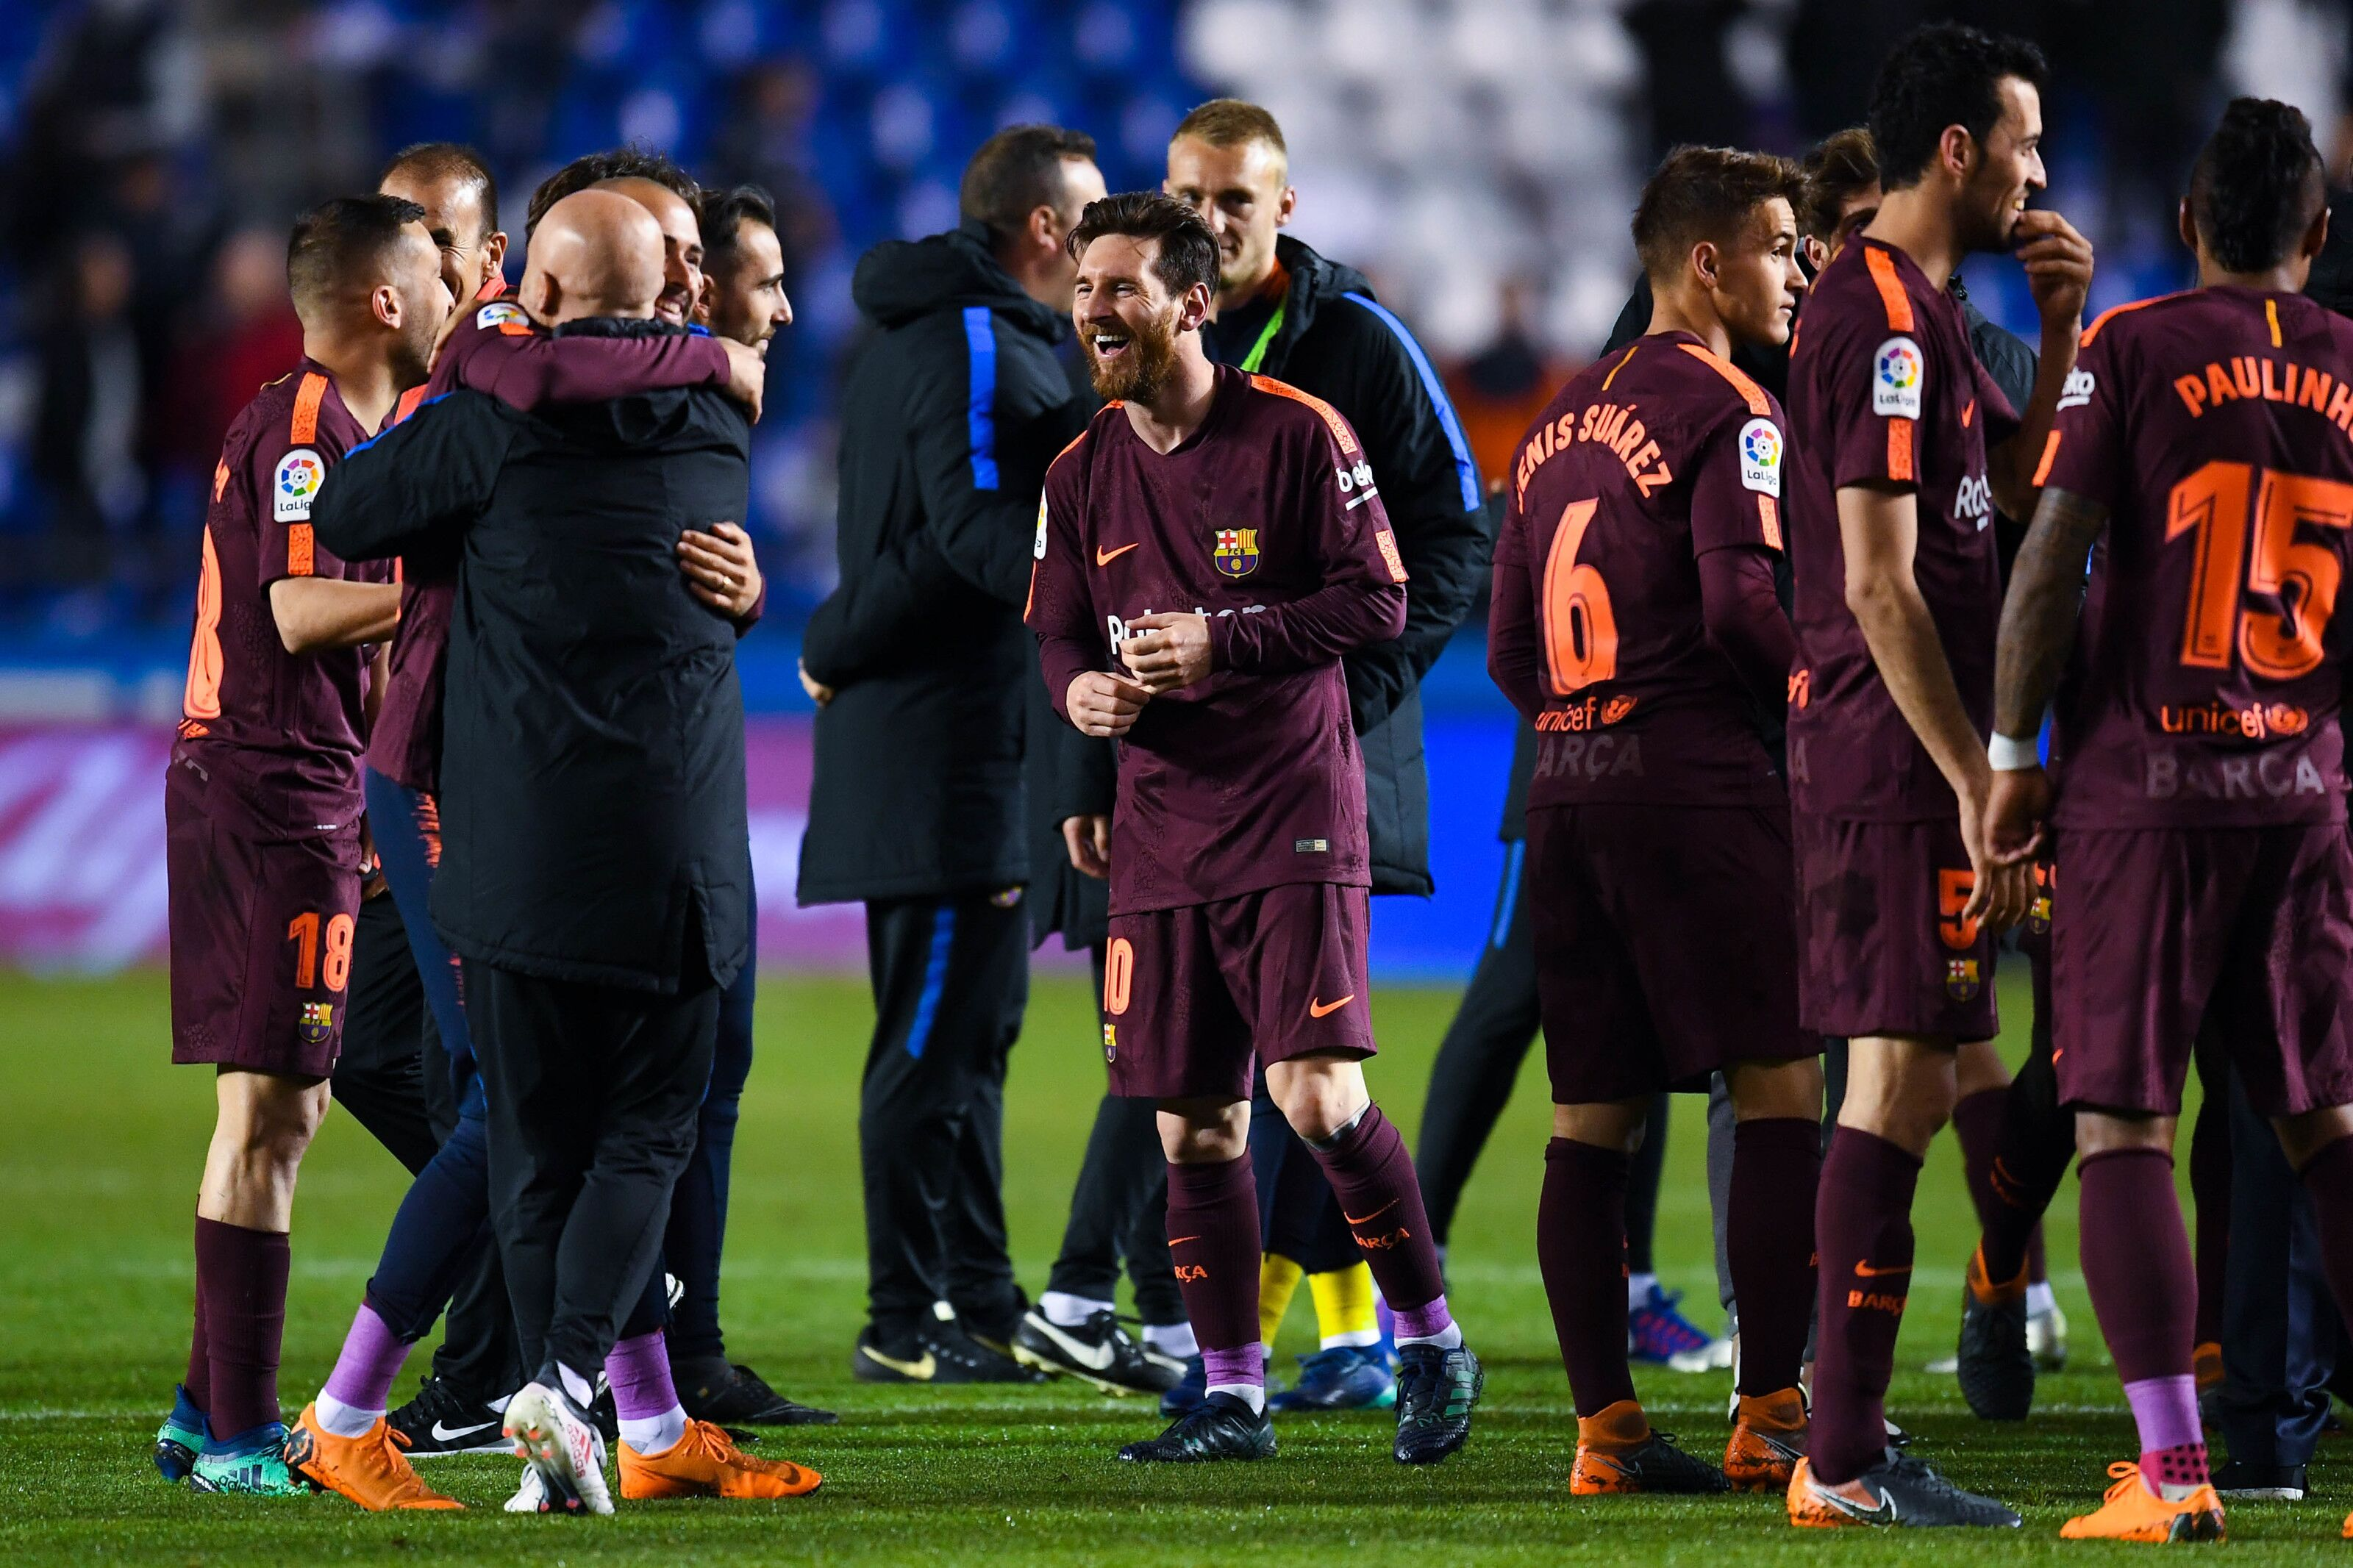 Real Madrid Telat Ucapkan Selamat Untuk Barcelona